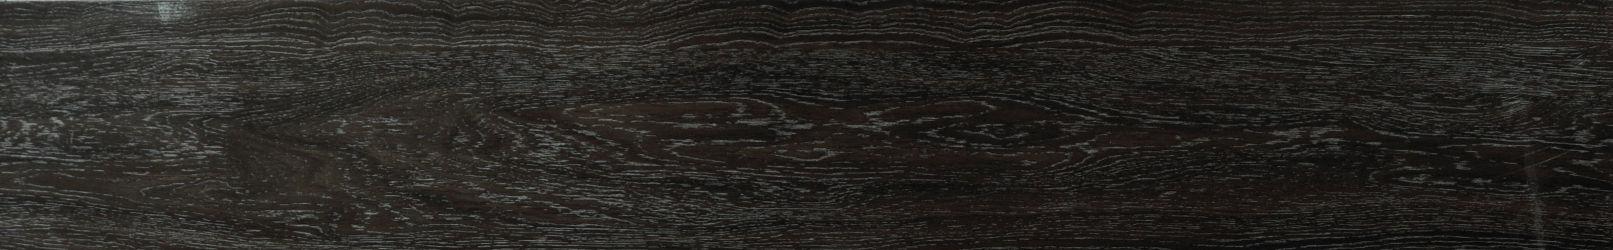 Ламинат Imperial Ibiza 845 Дуб графит 1215x196x8мм доска